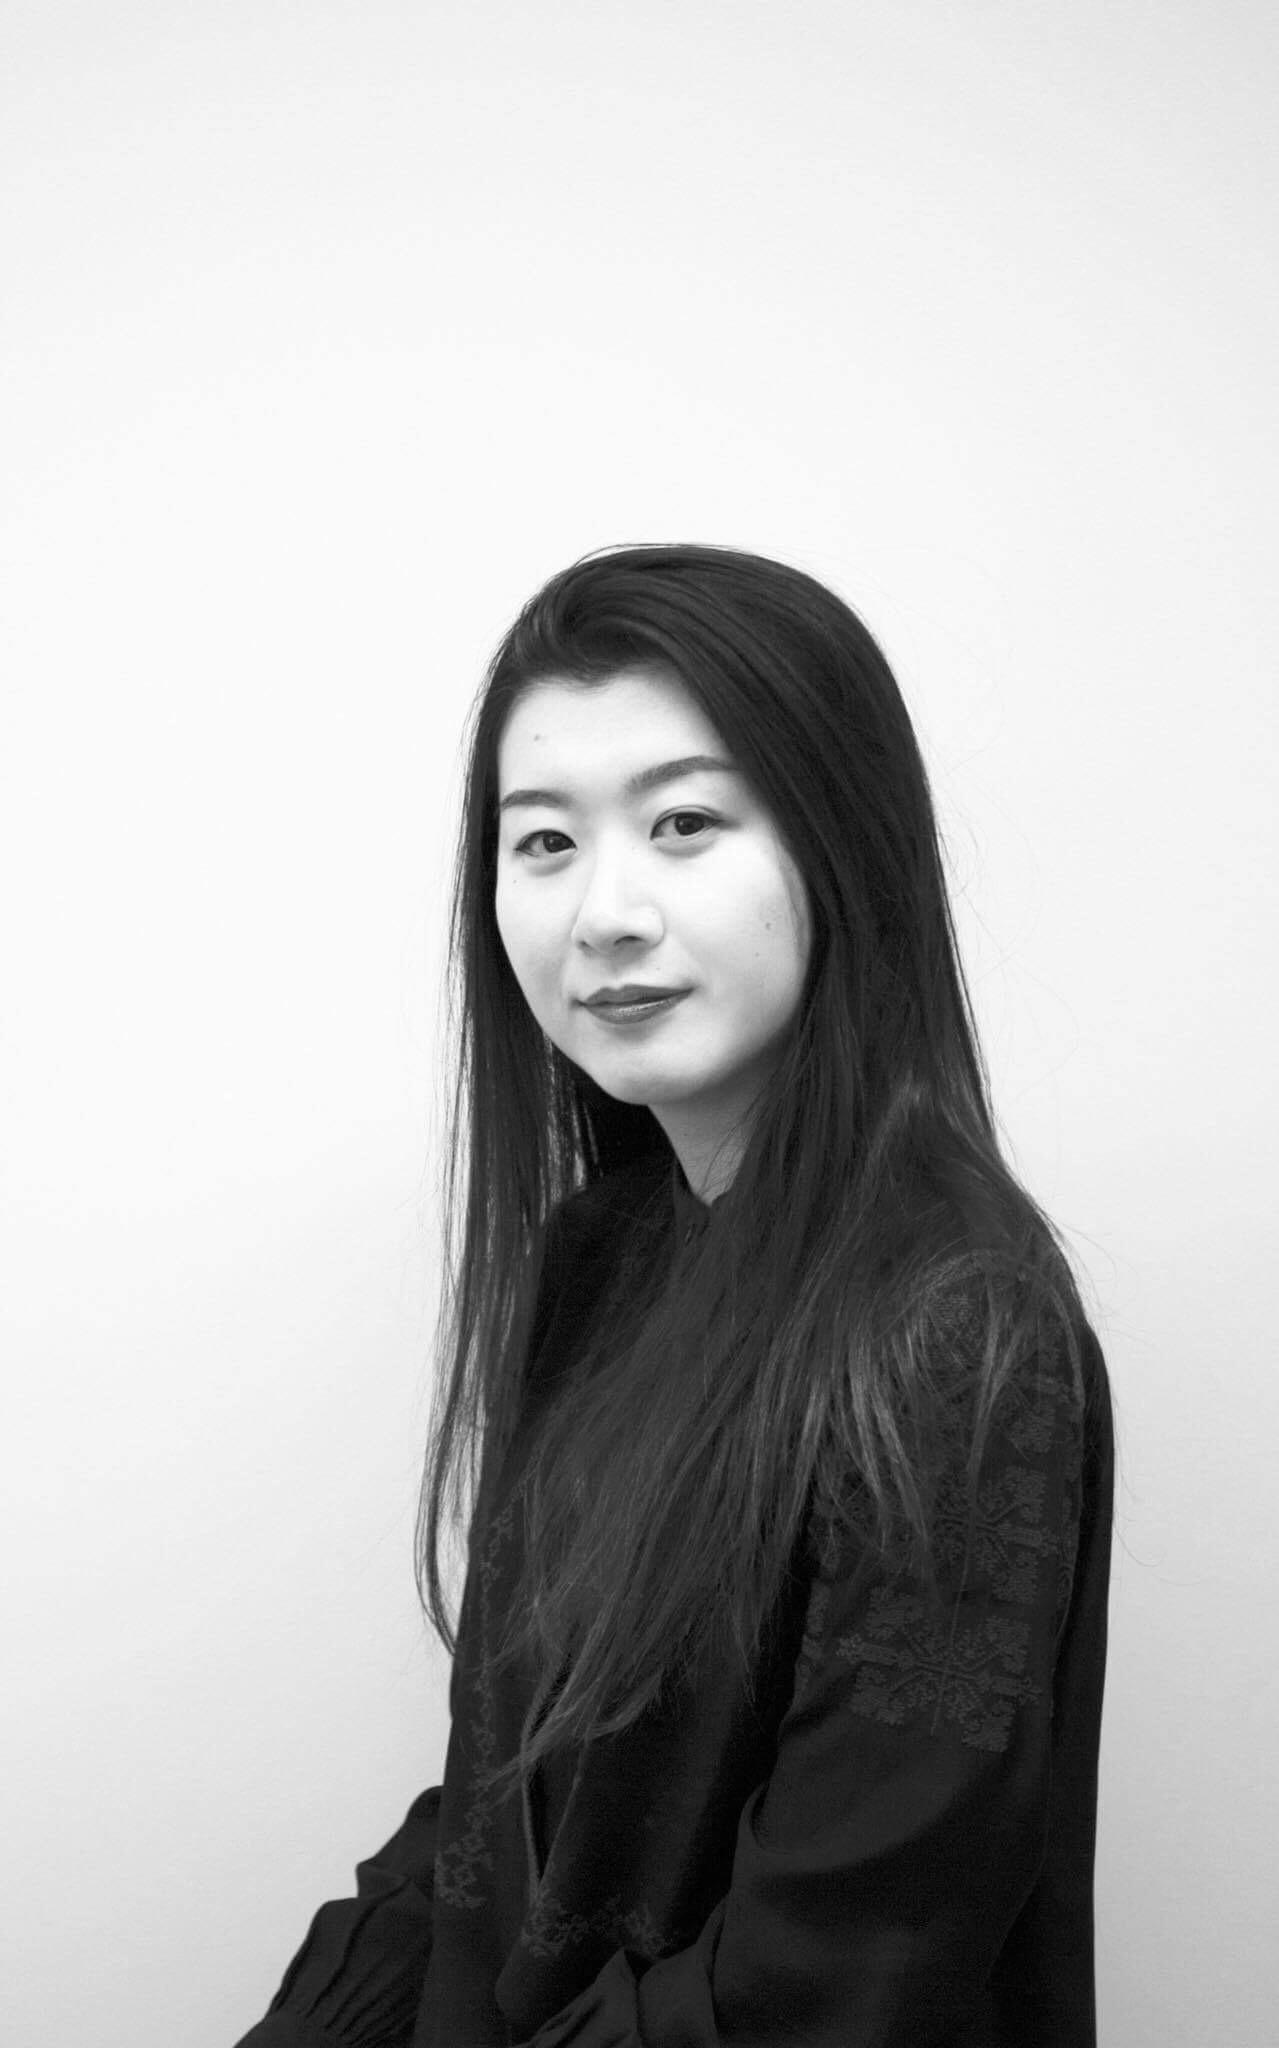 Ruoxi Wang